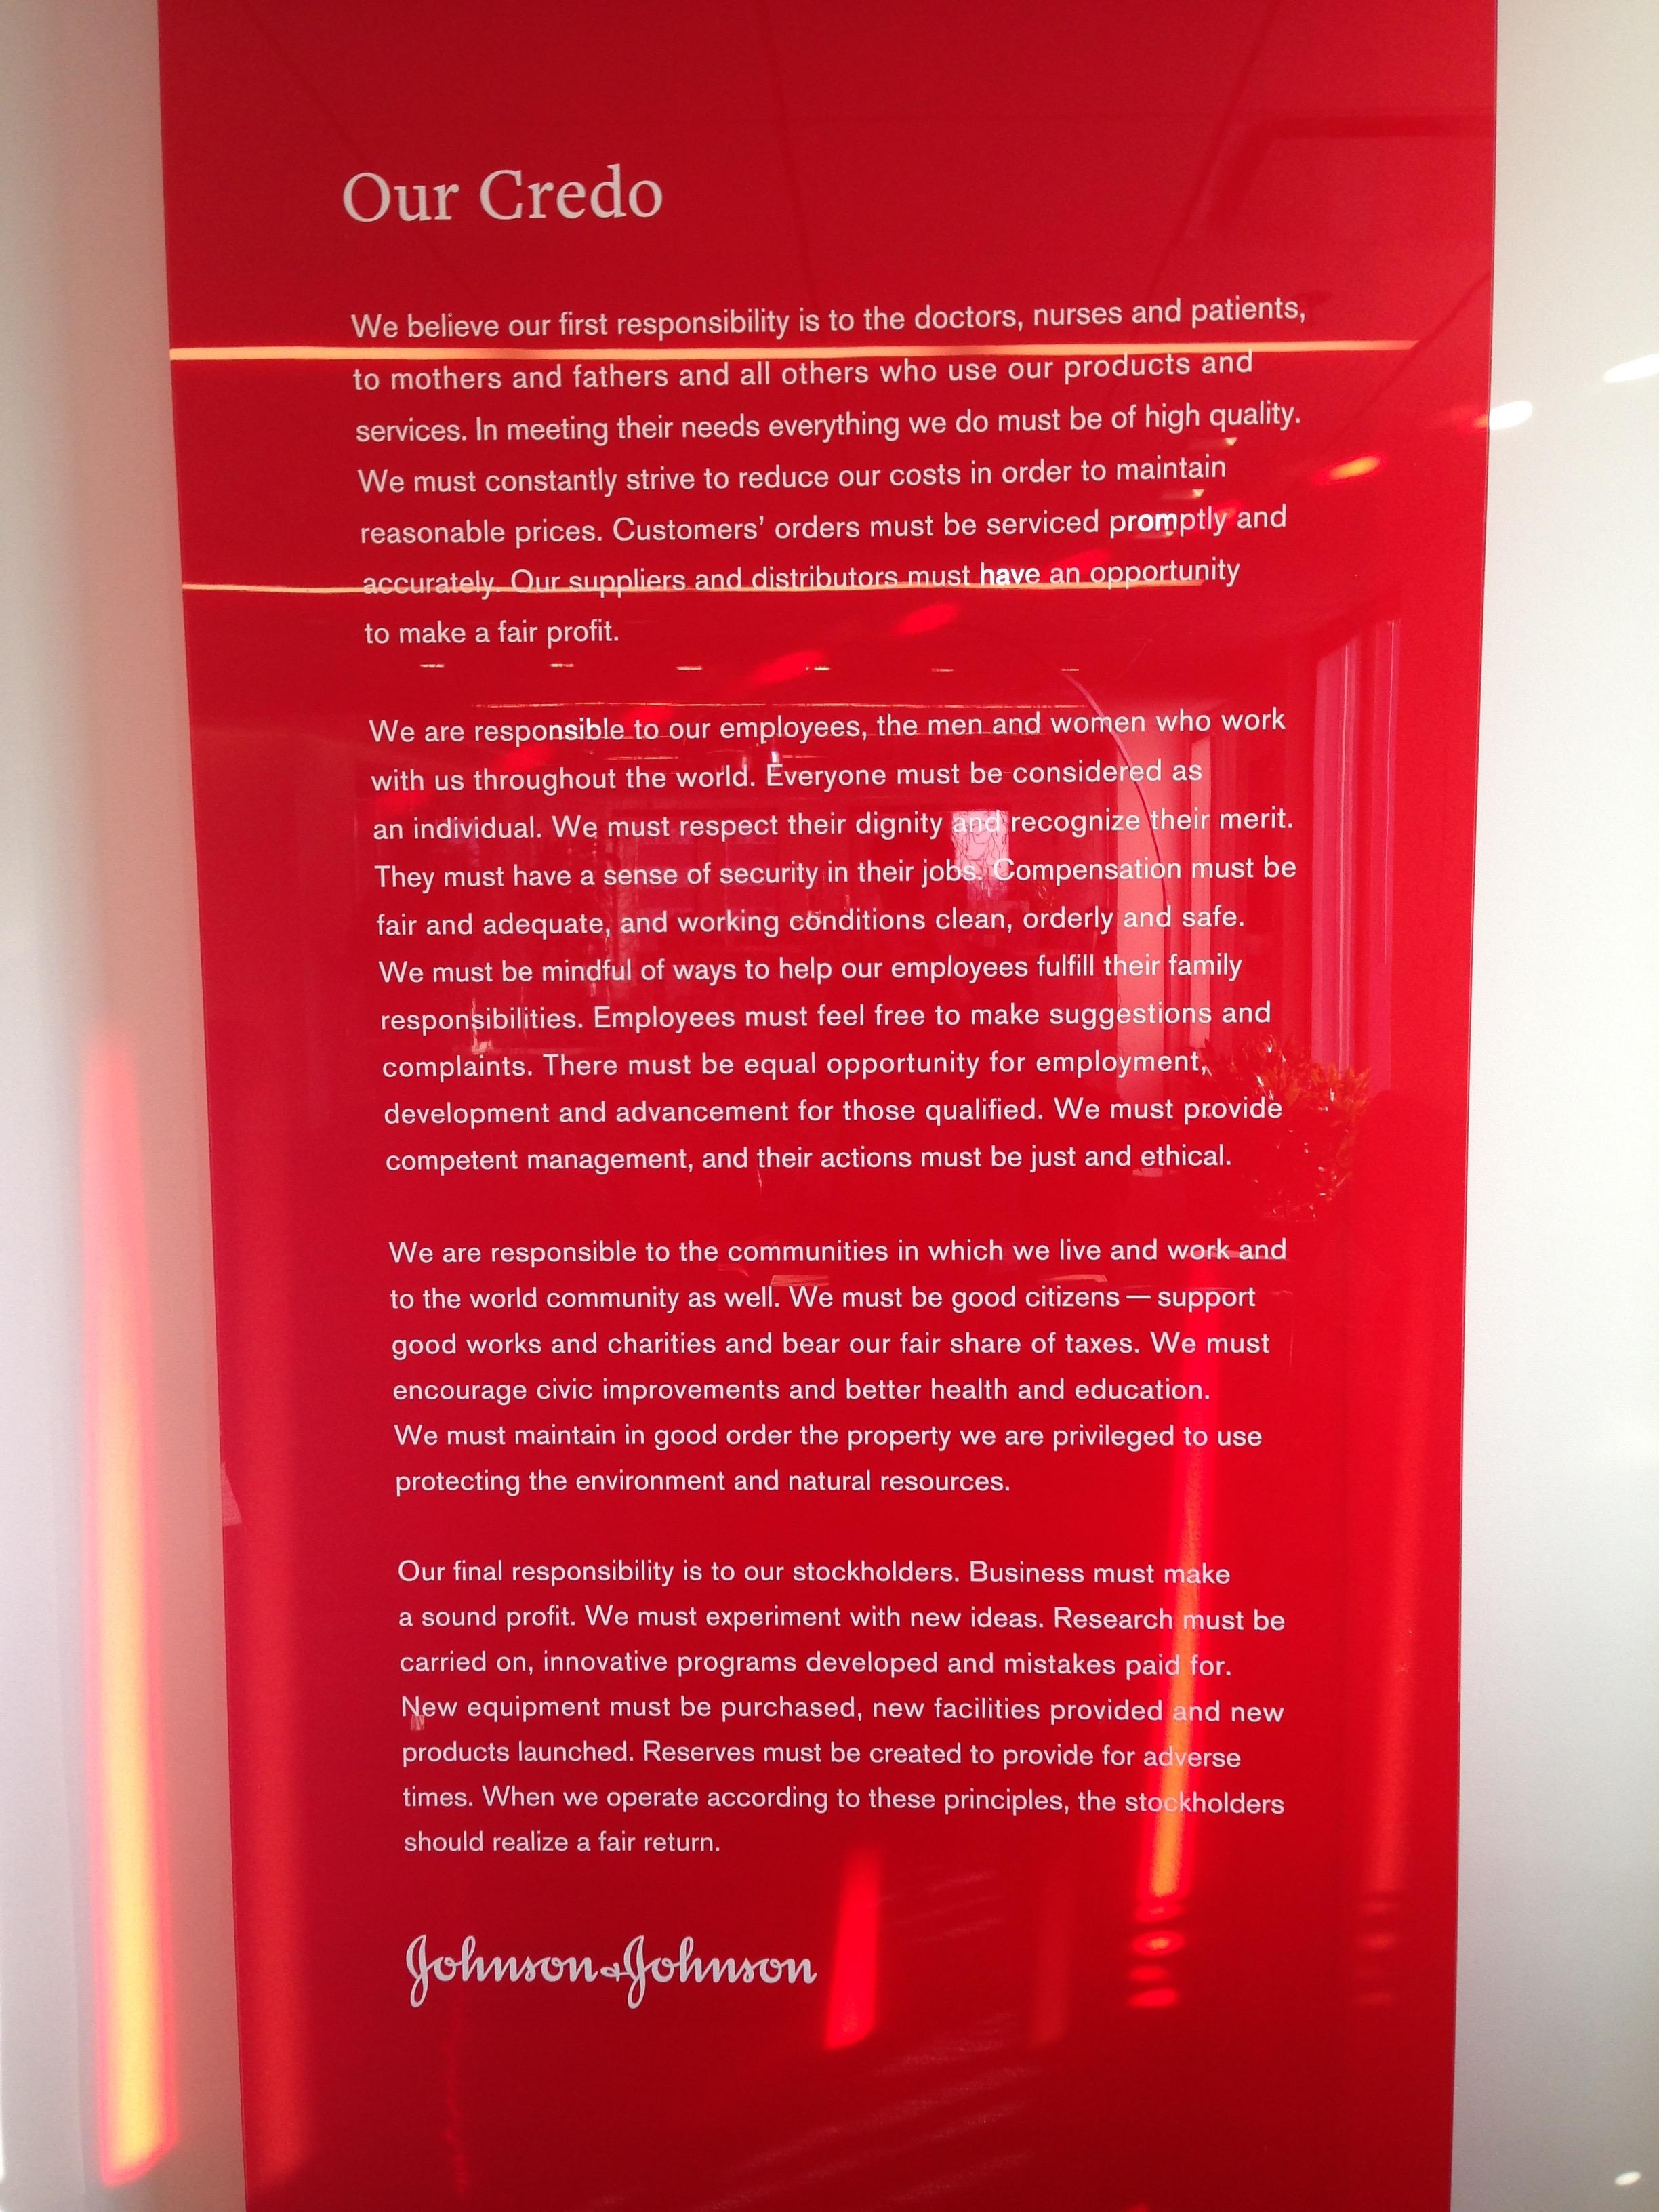 Cultural Artifacts Case Study The Jj Credo Amy Bucher Phd